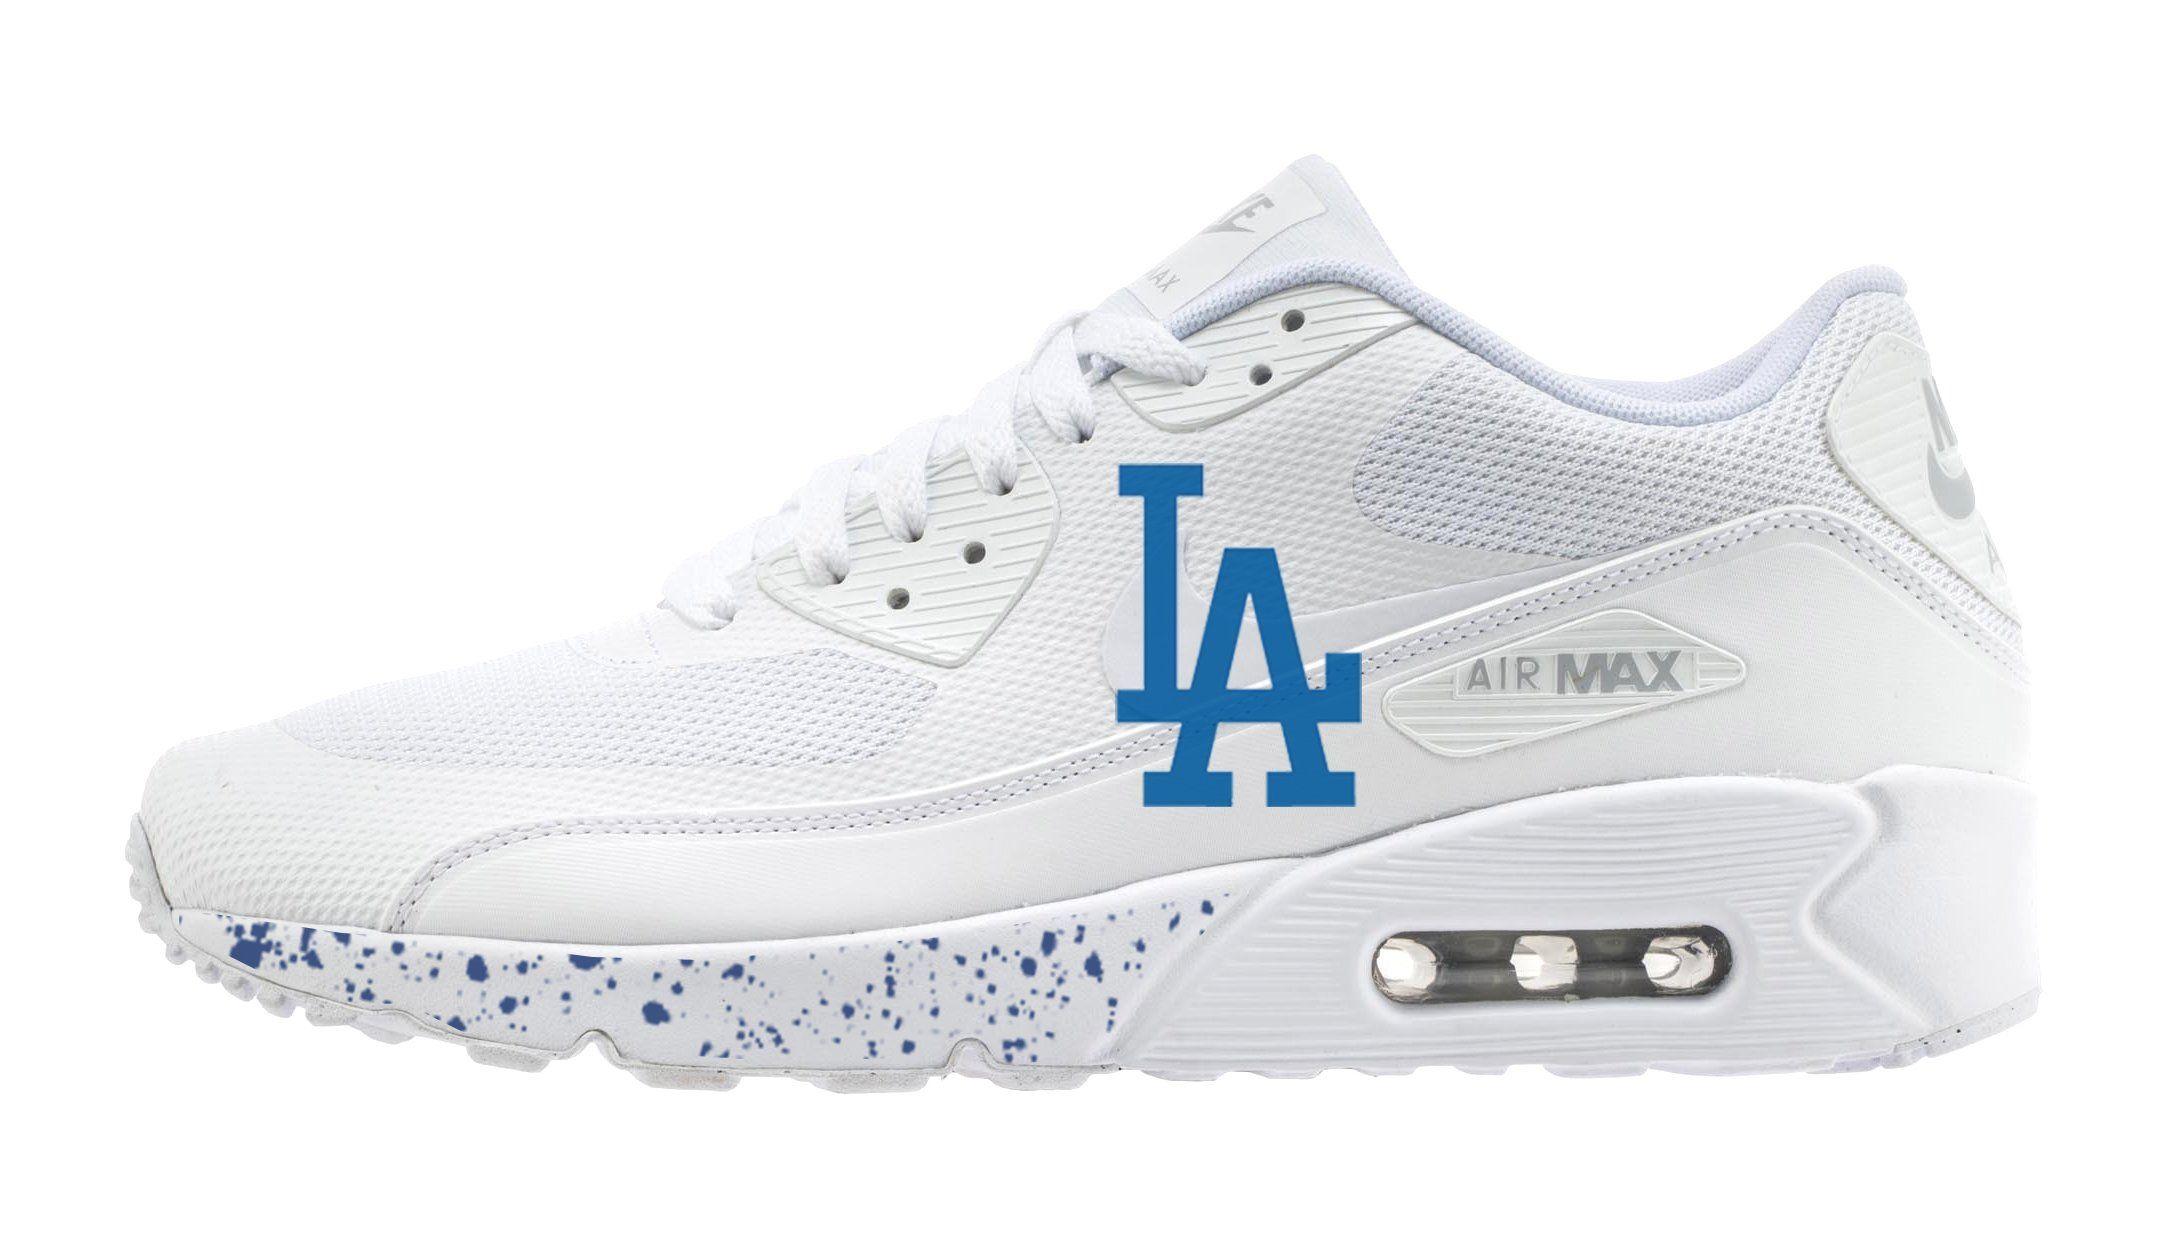 52d661f4857d2 Bandana Fever LA Dodgers Big Print Custom White Nike Air Max Shoes ...